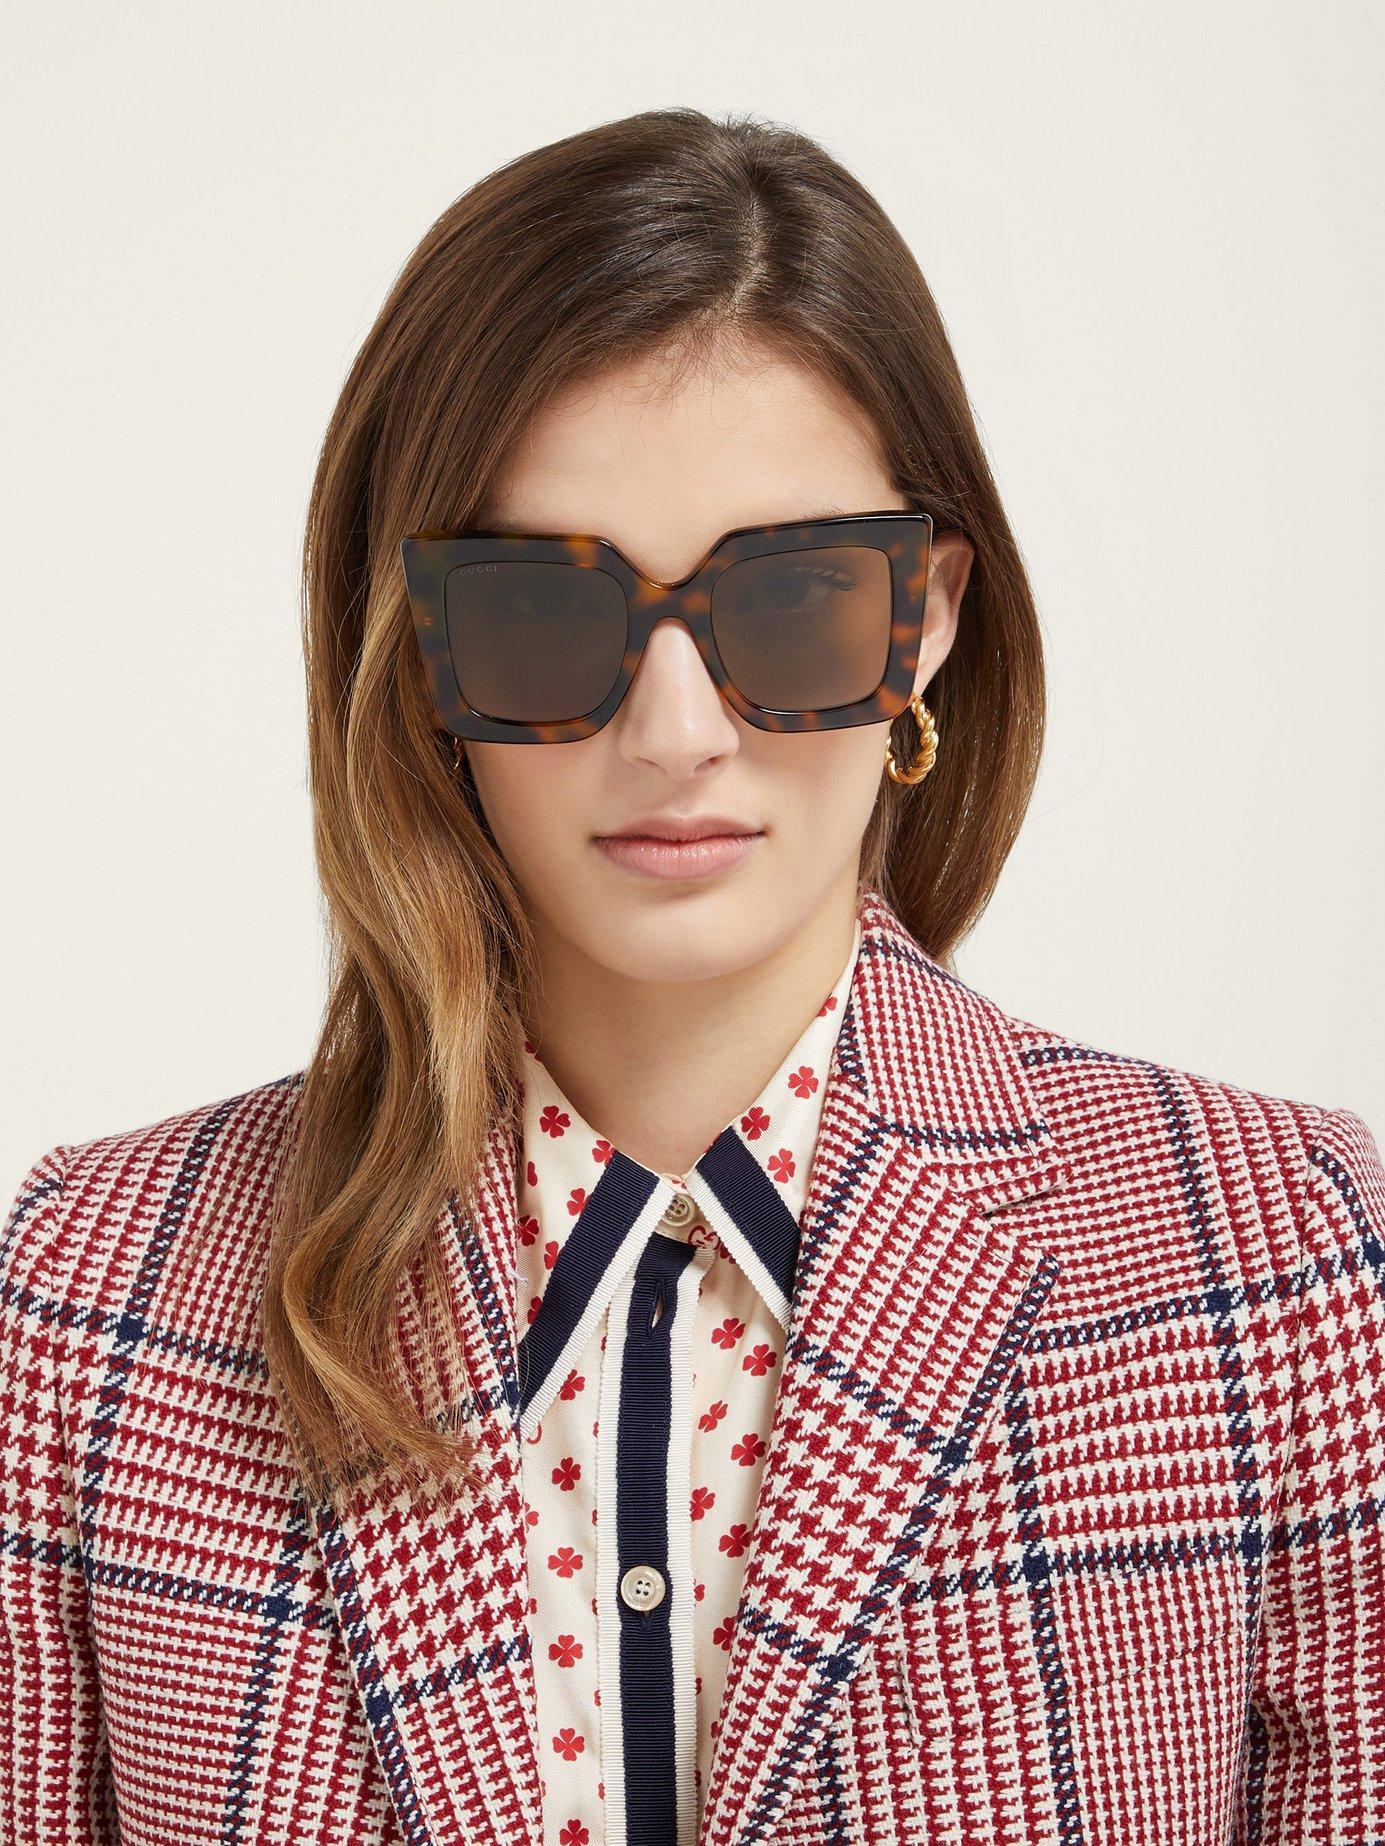 00b0d33c228ce Gucci. Women s Oversized Square Acetate Sunglasses